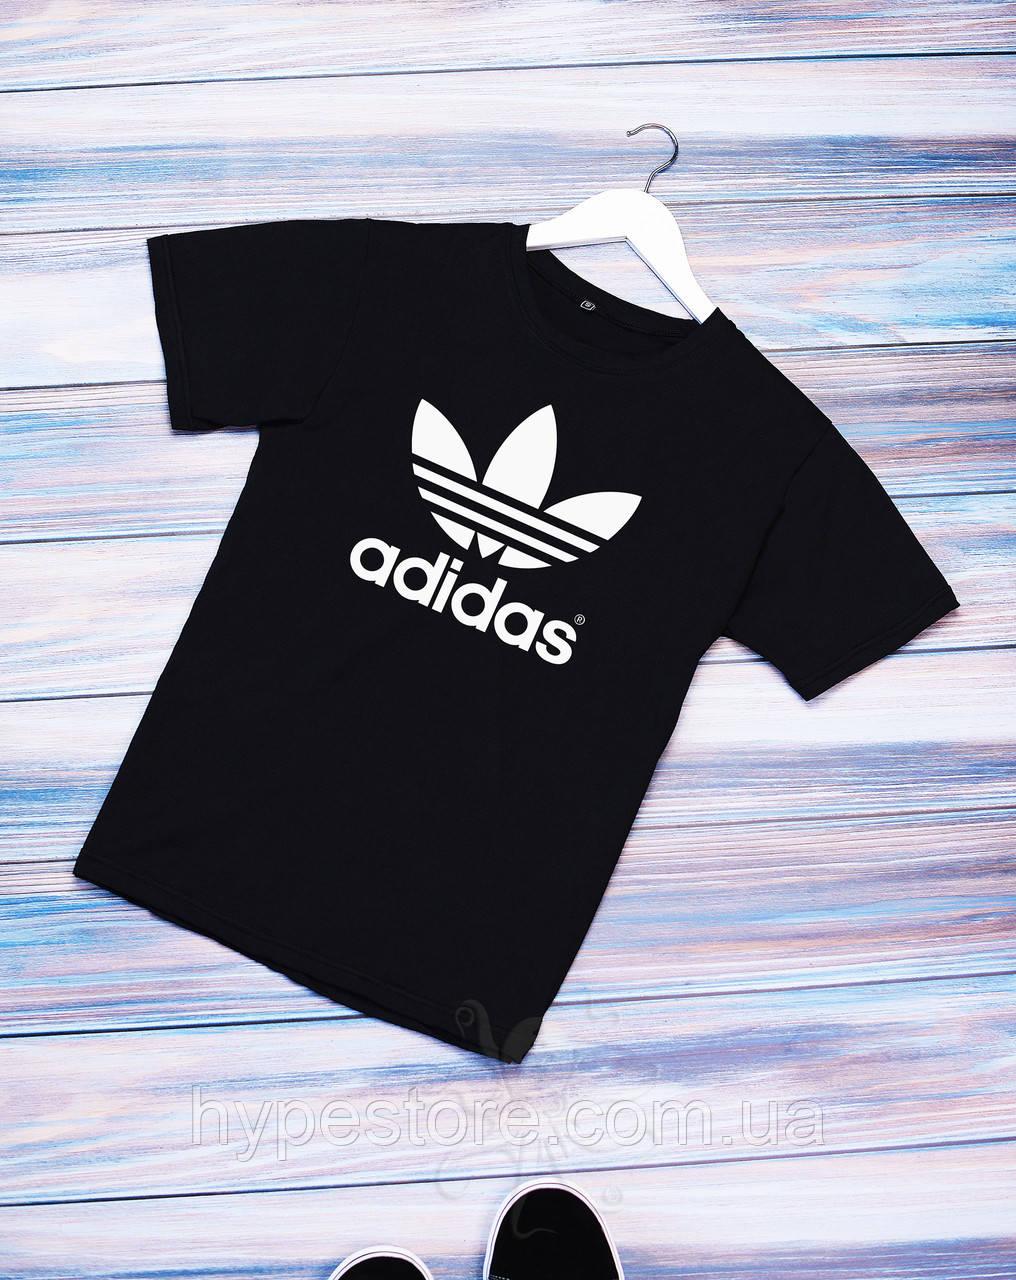 Мужская черная футболка, чоловіча футболка в стиле Adidas, РАСПРОДАЖА!